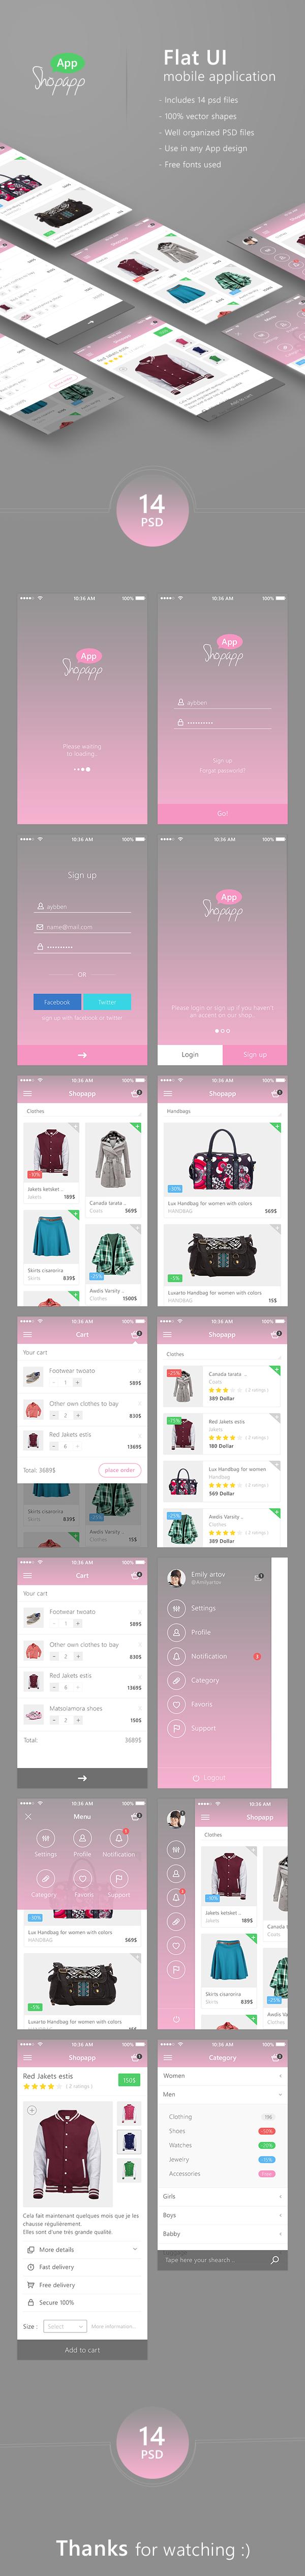 android app kit app ui clean flat UI ios ios7 iphone